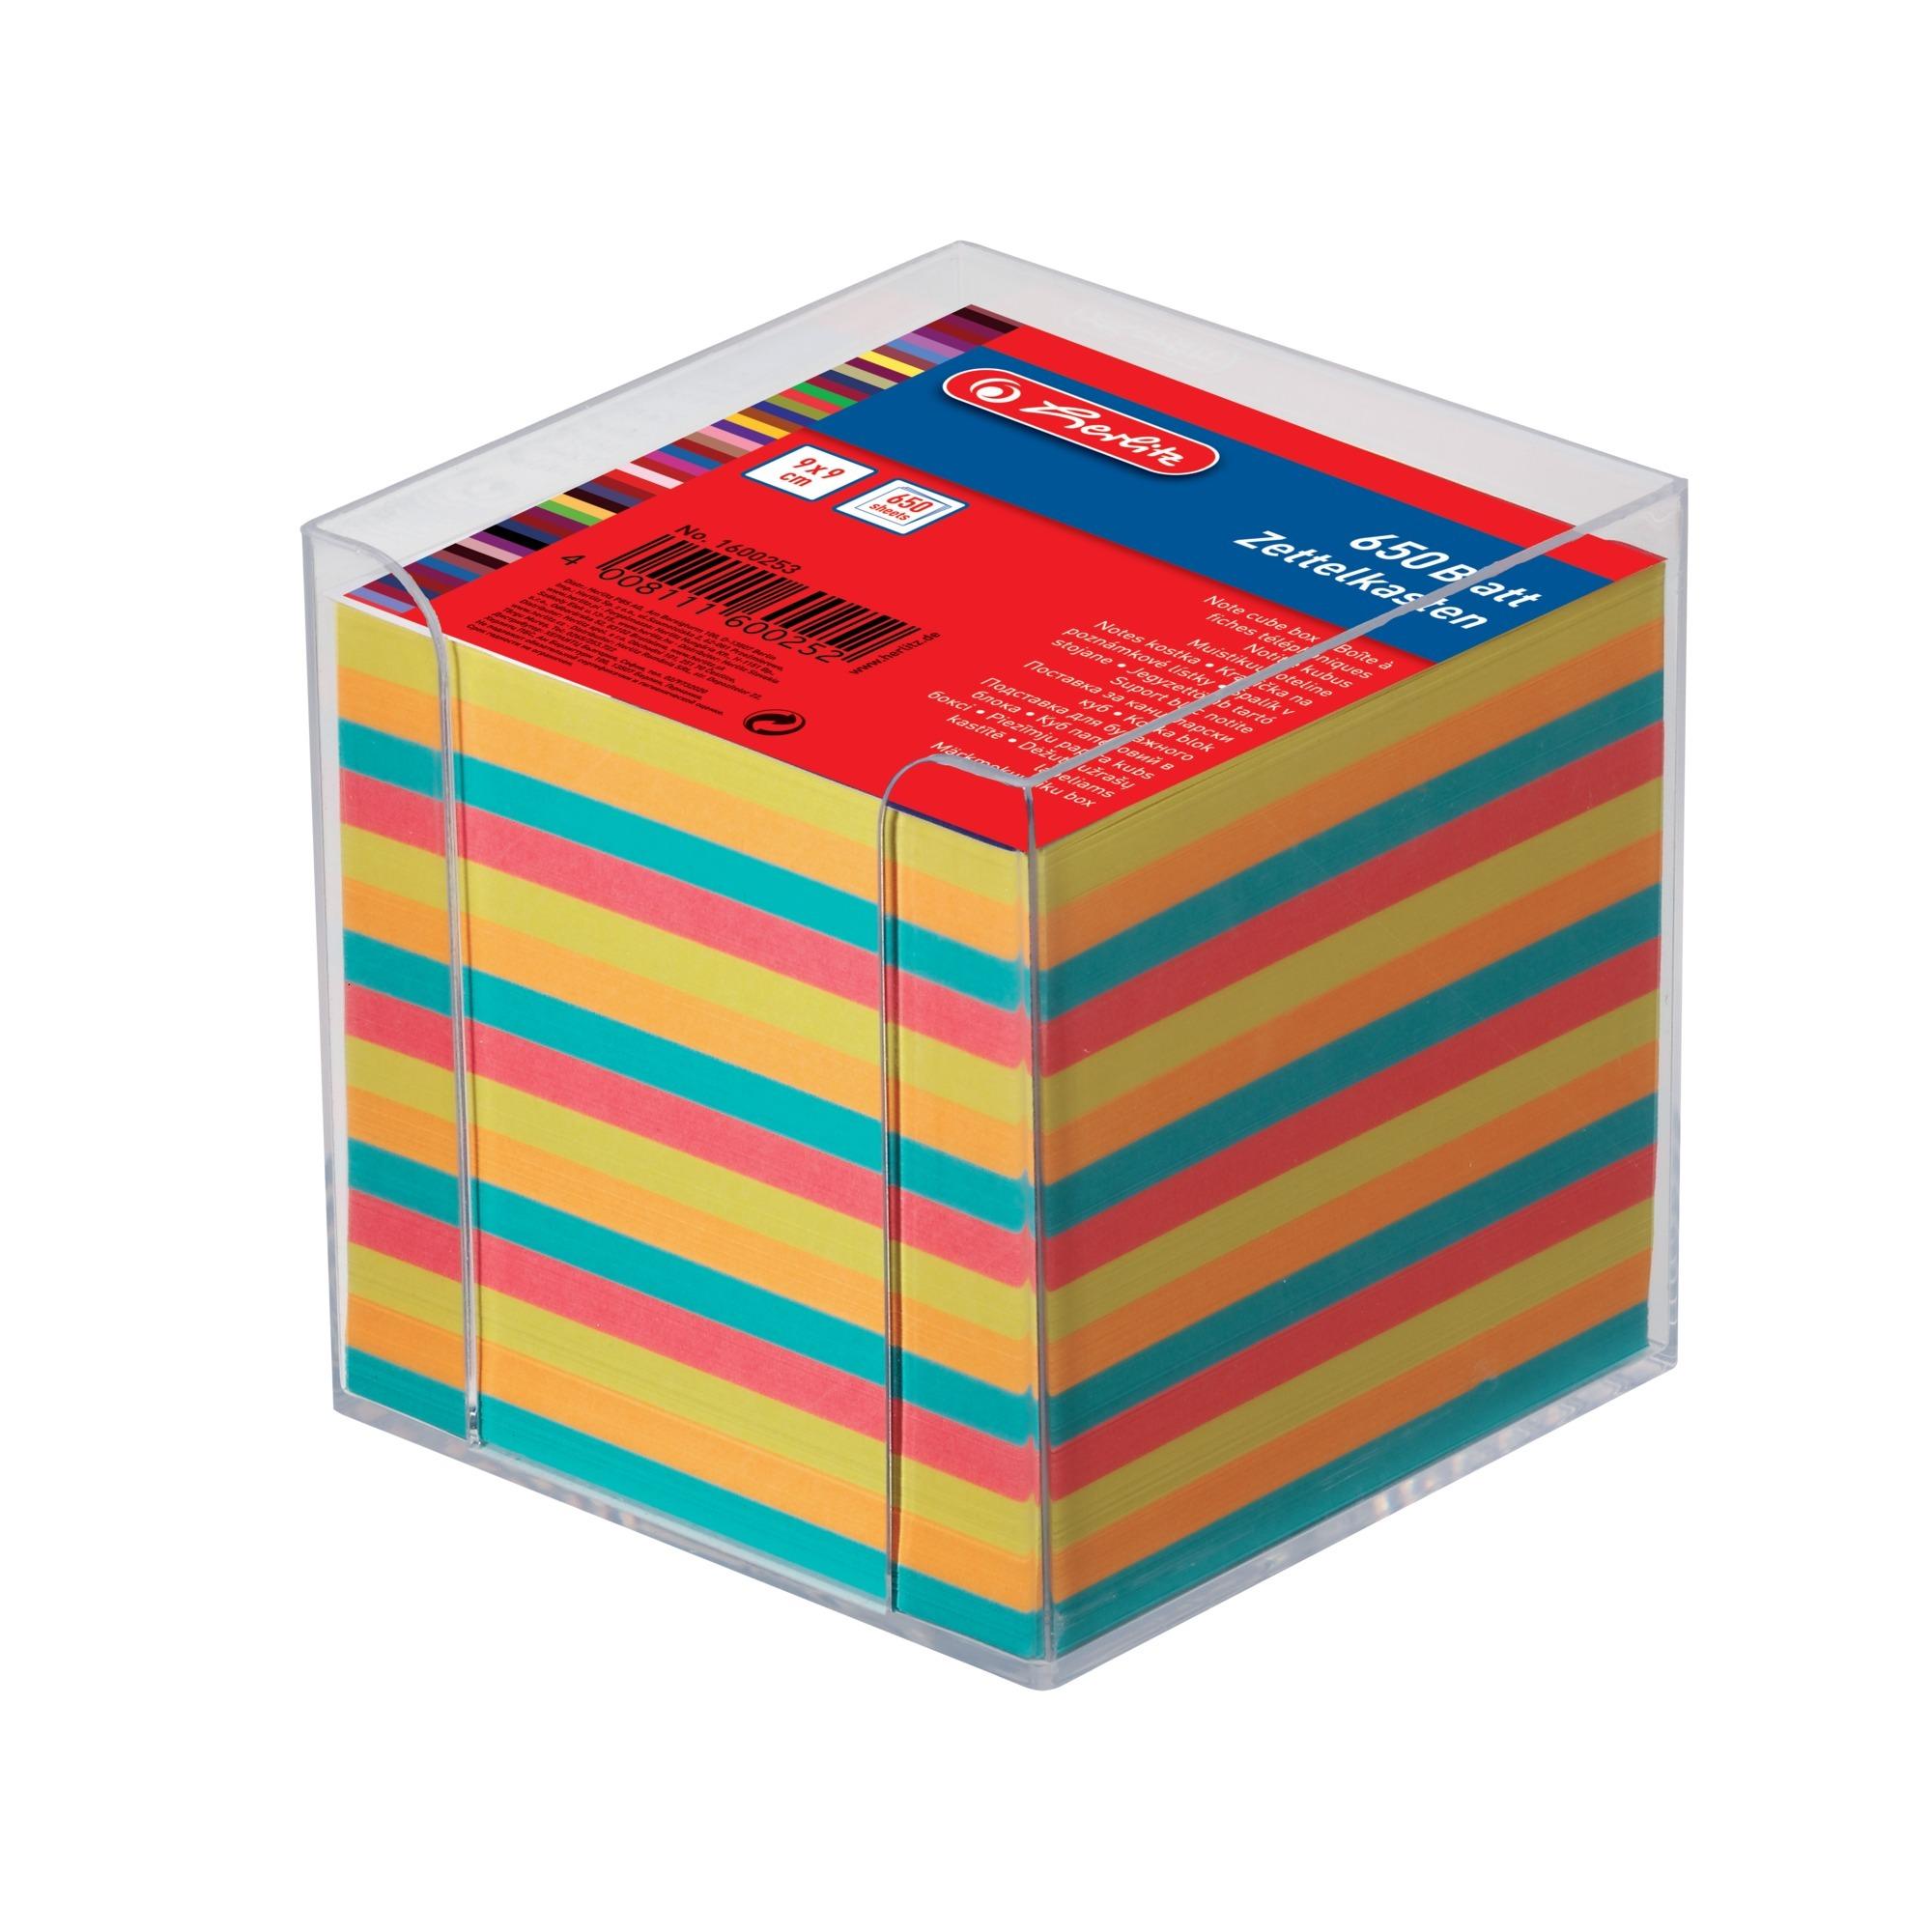 01600253 Plaza Multicolor nota autoadhesiva, Organizador